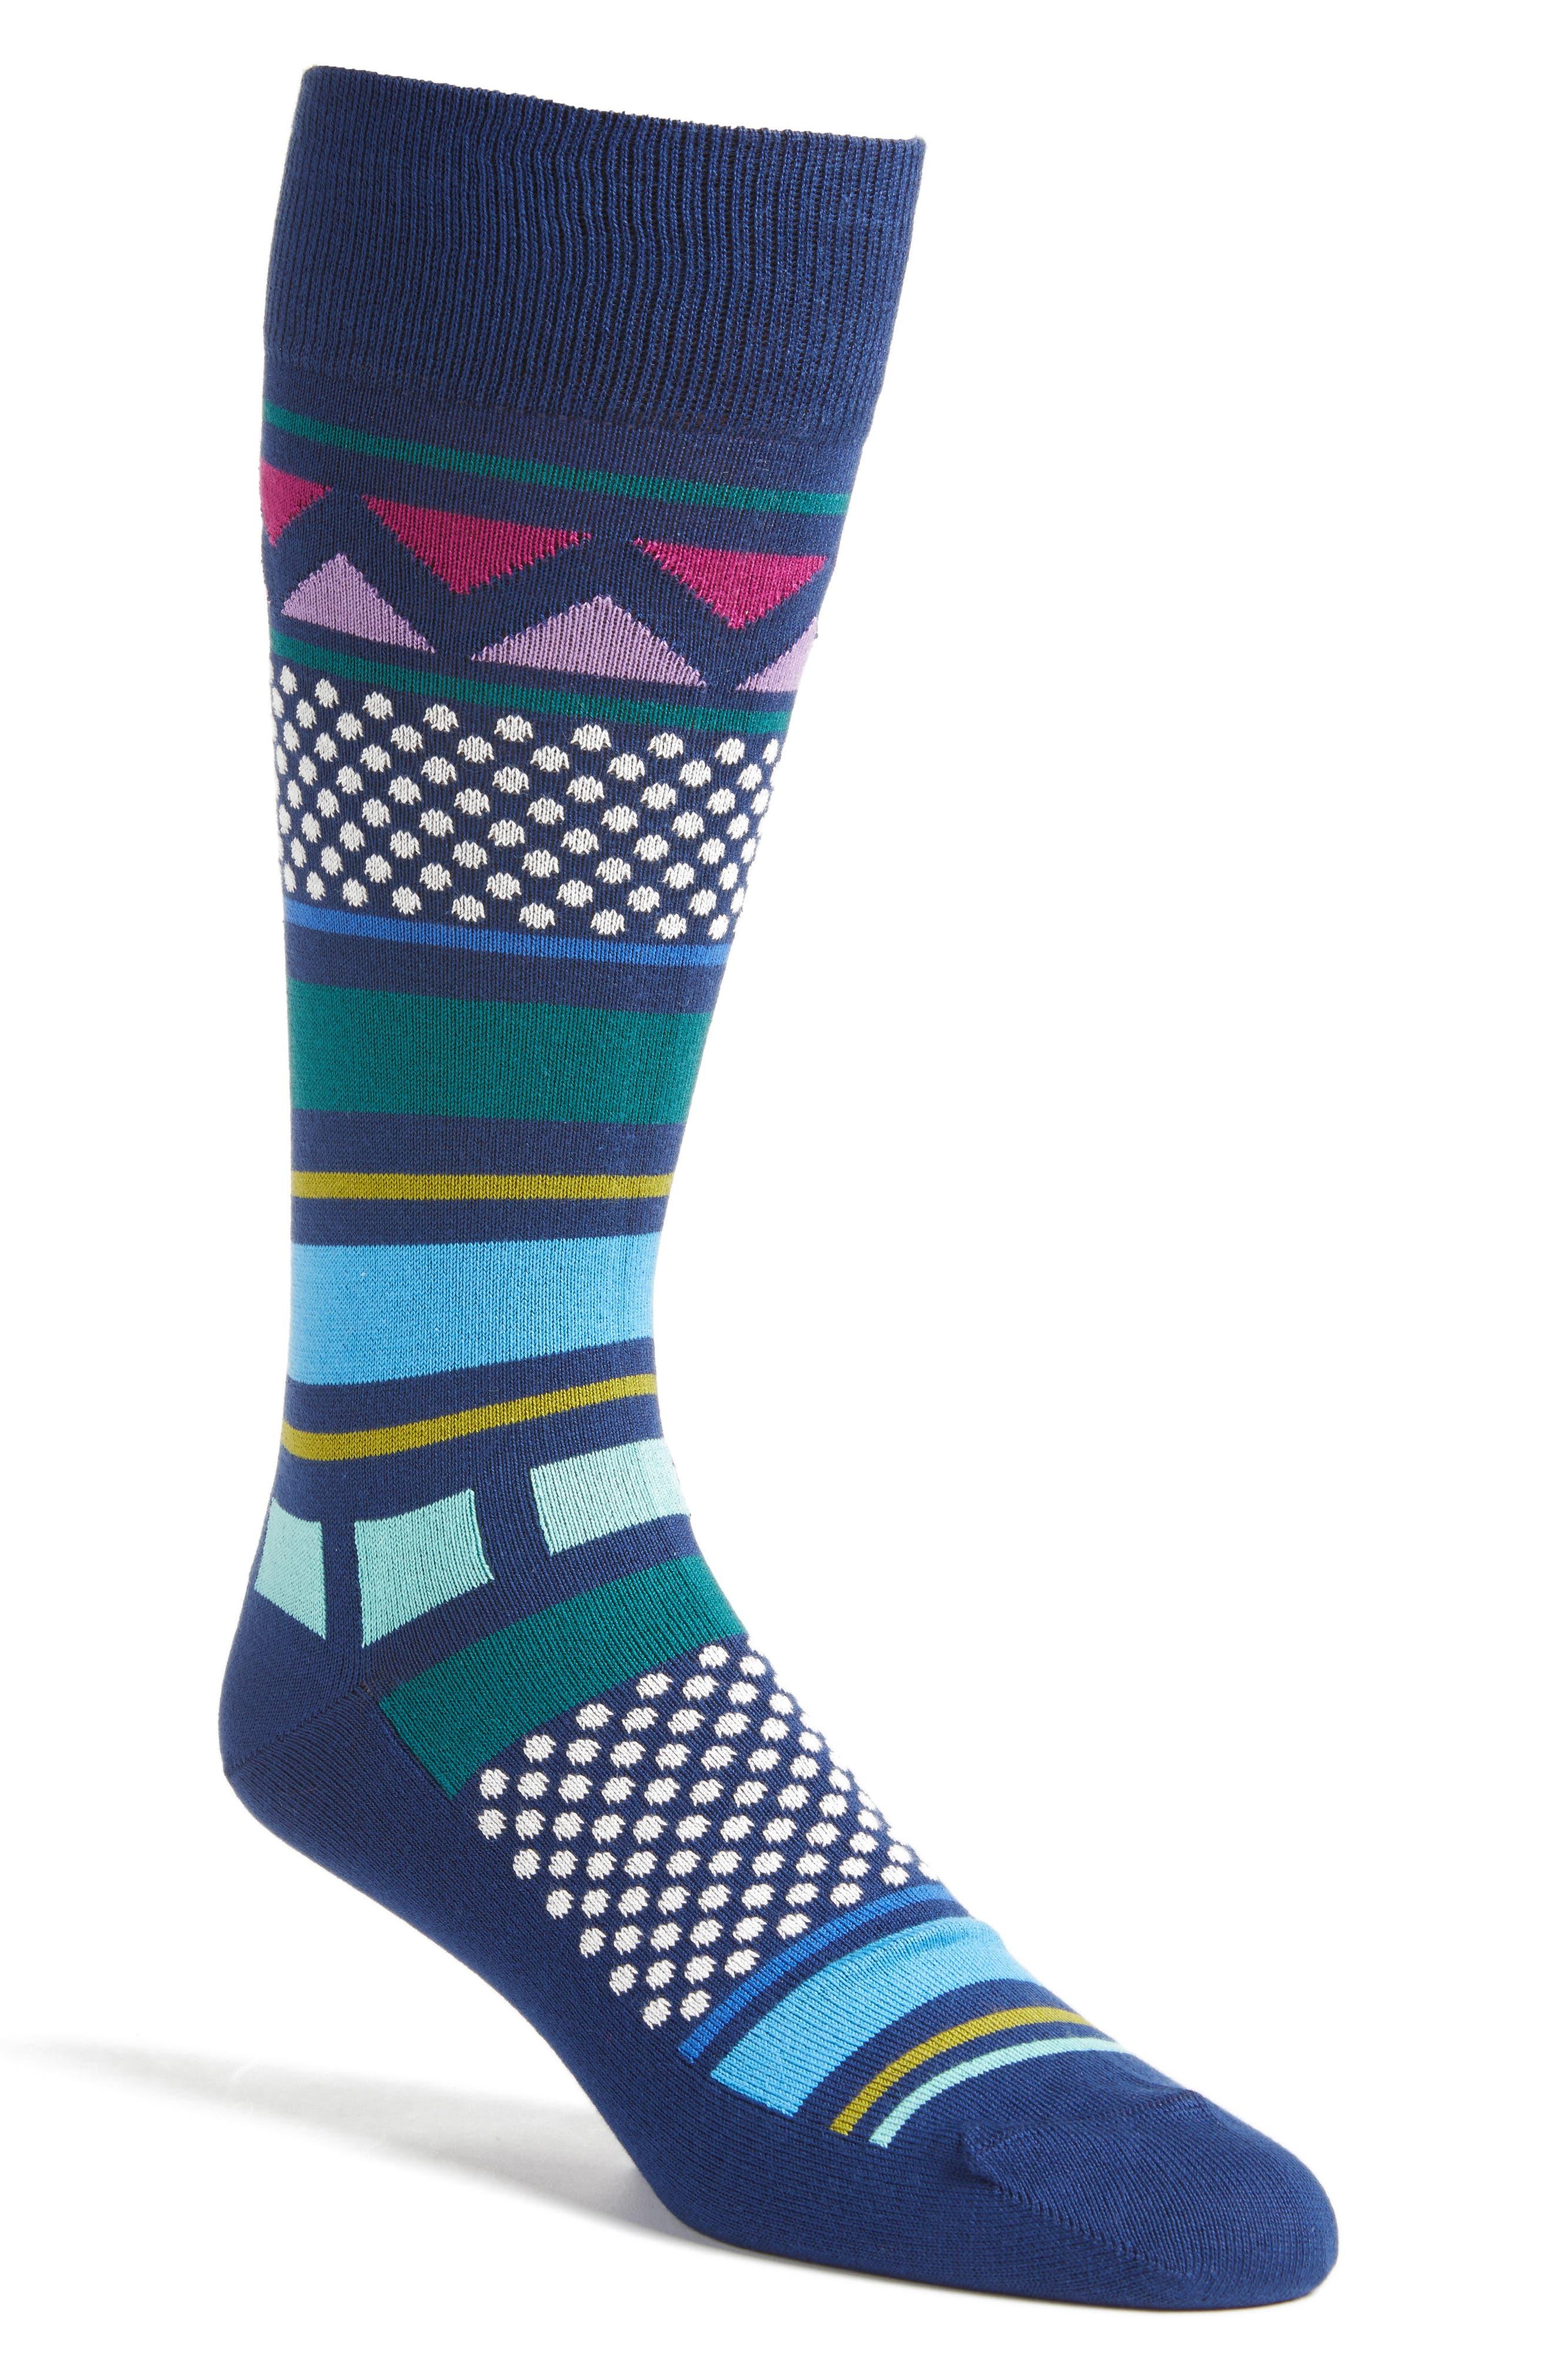 Alternate Image 1 Selected - Paul Smith KWA Crew Socks